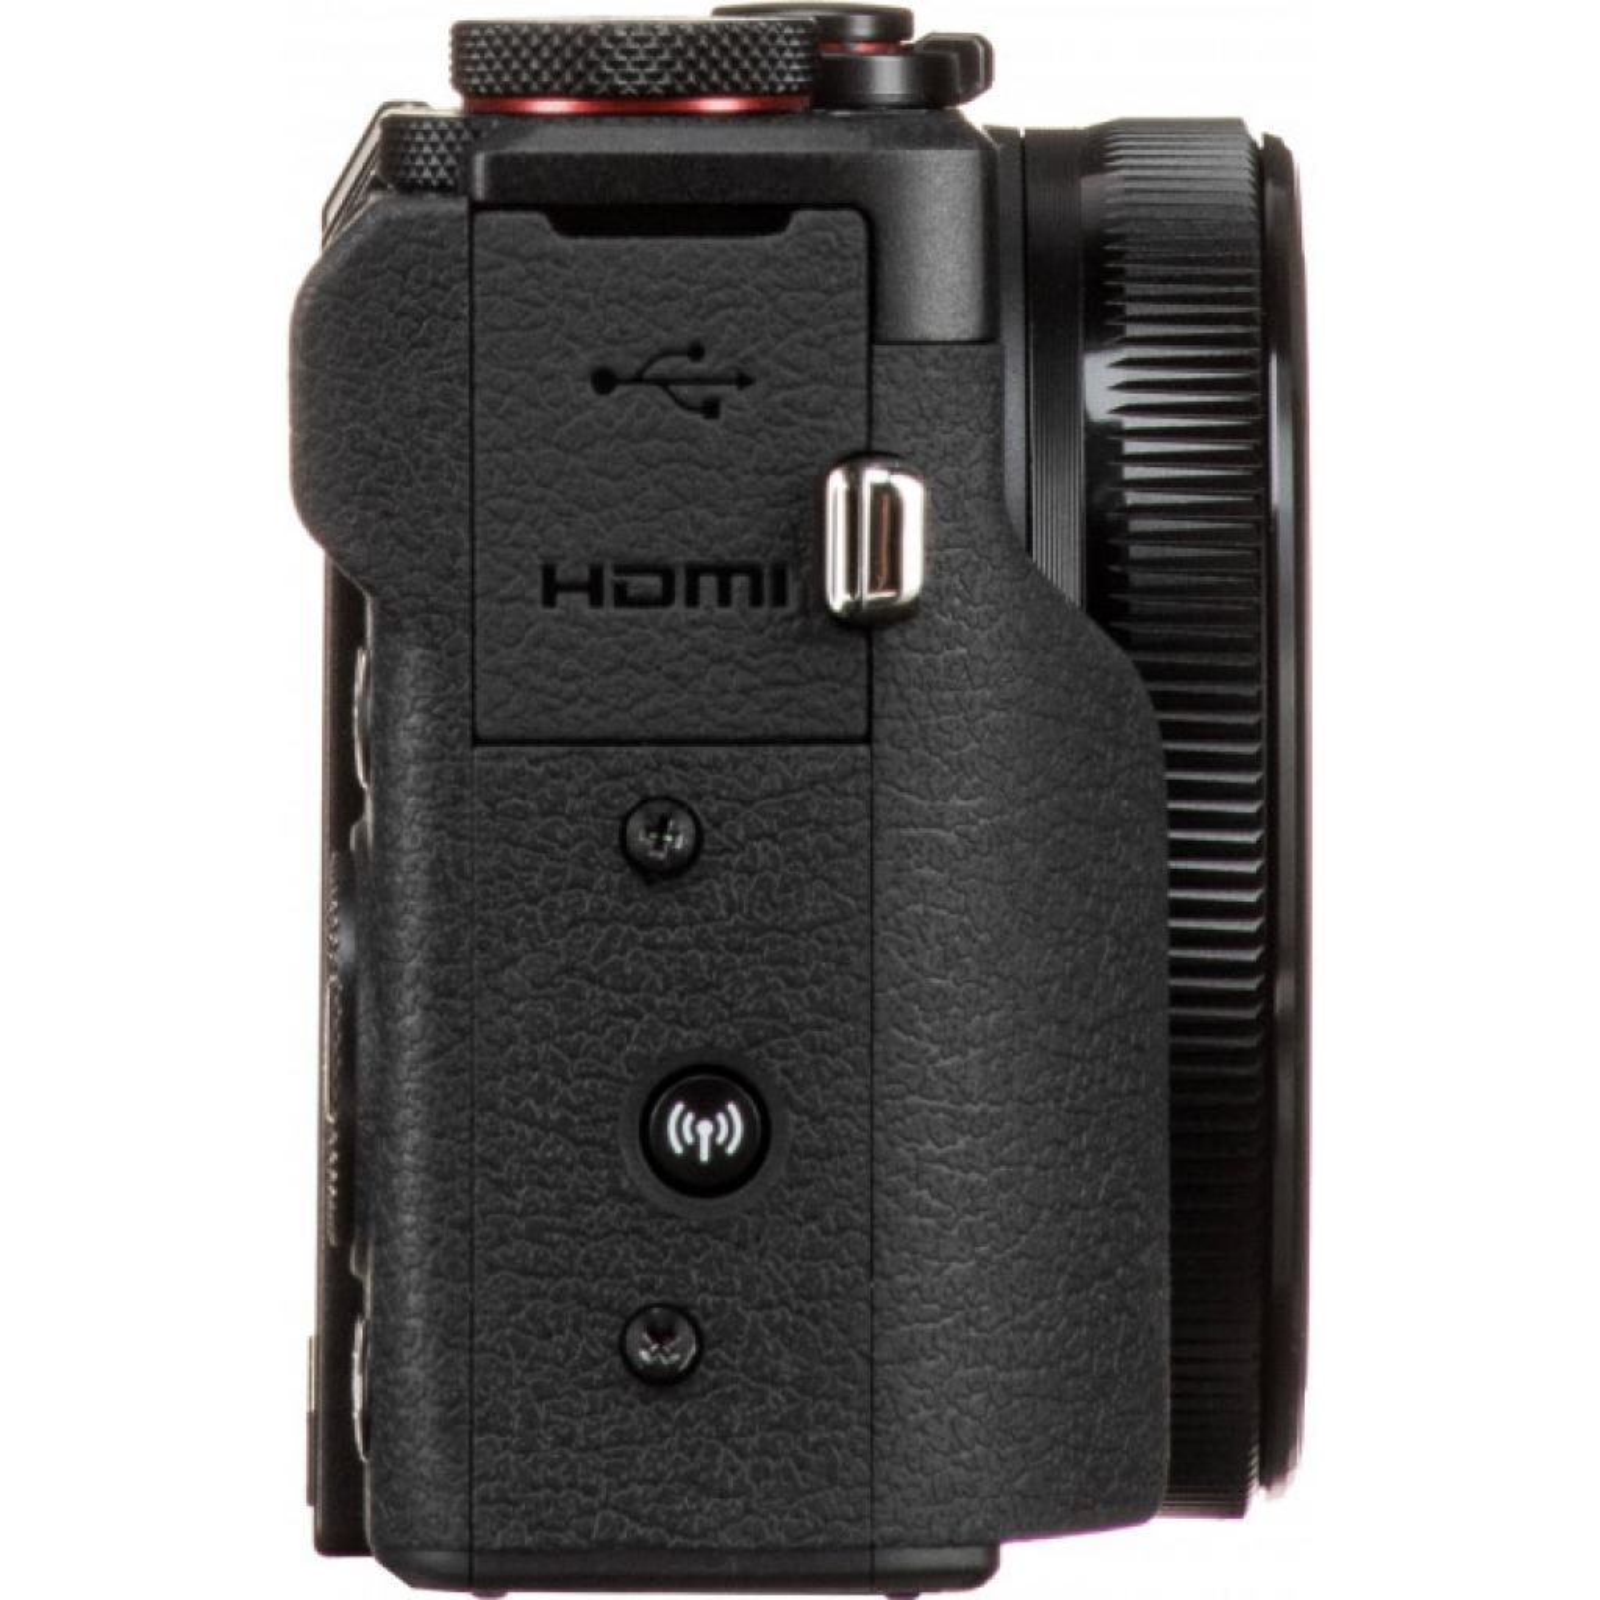 Цифровой фотоаппарат Canon Powershot G7 X Mark III Black (3637C013) изображение 11